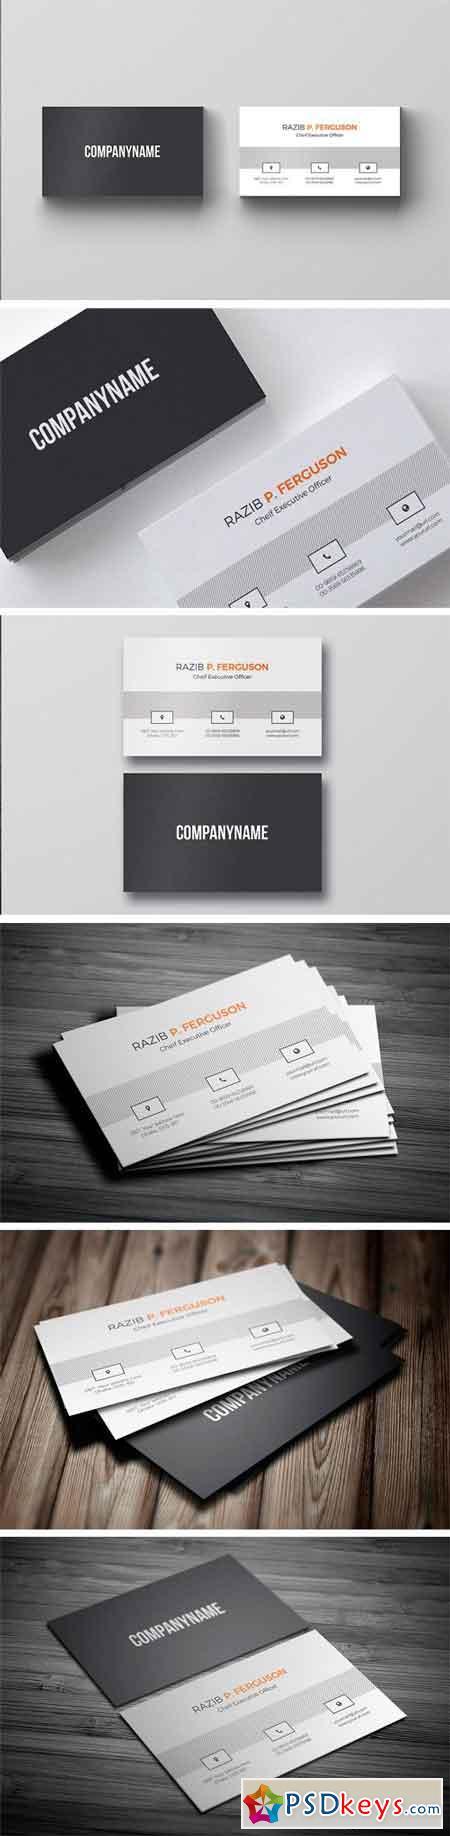 Clean Business Card 1257330